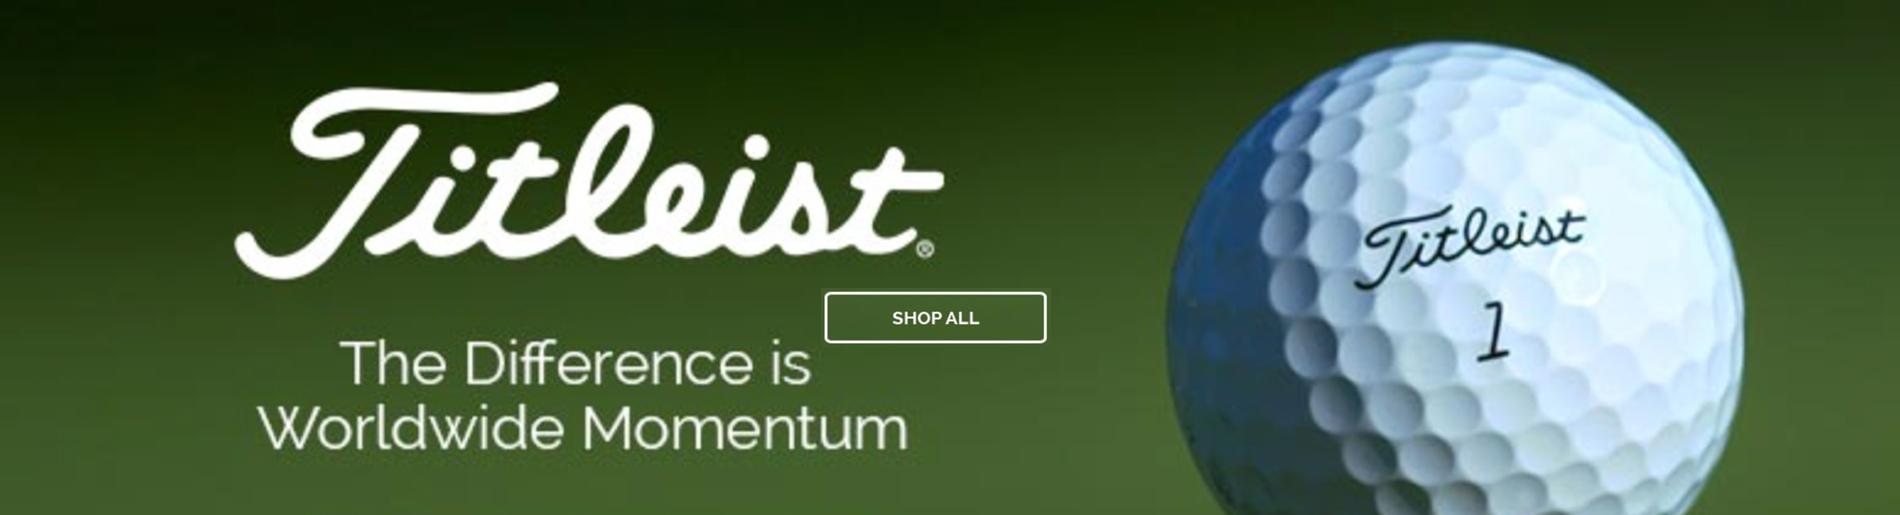 Titleist Golf Balls LakeBalls.com